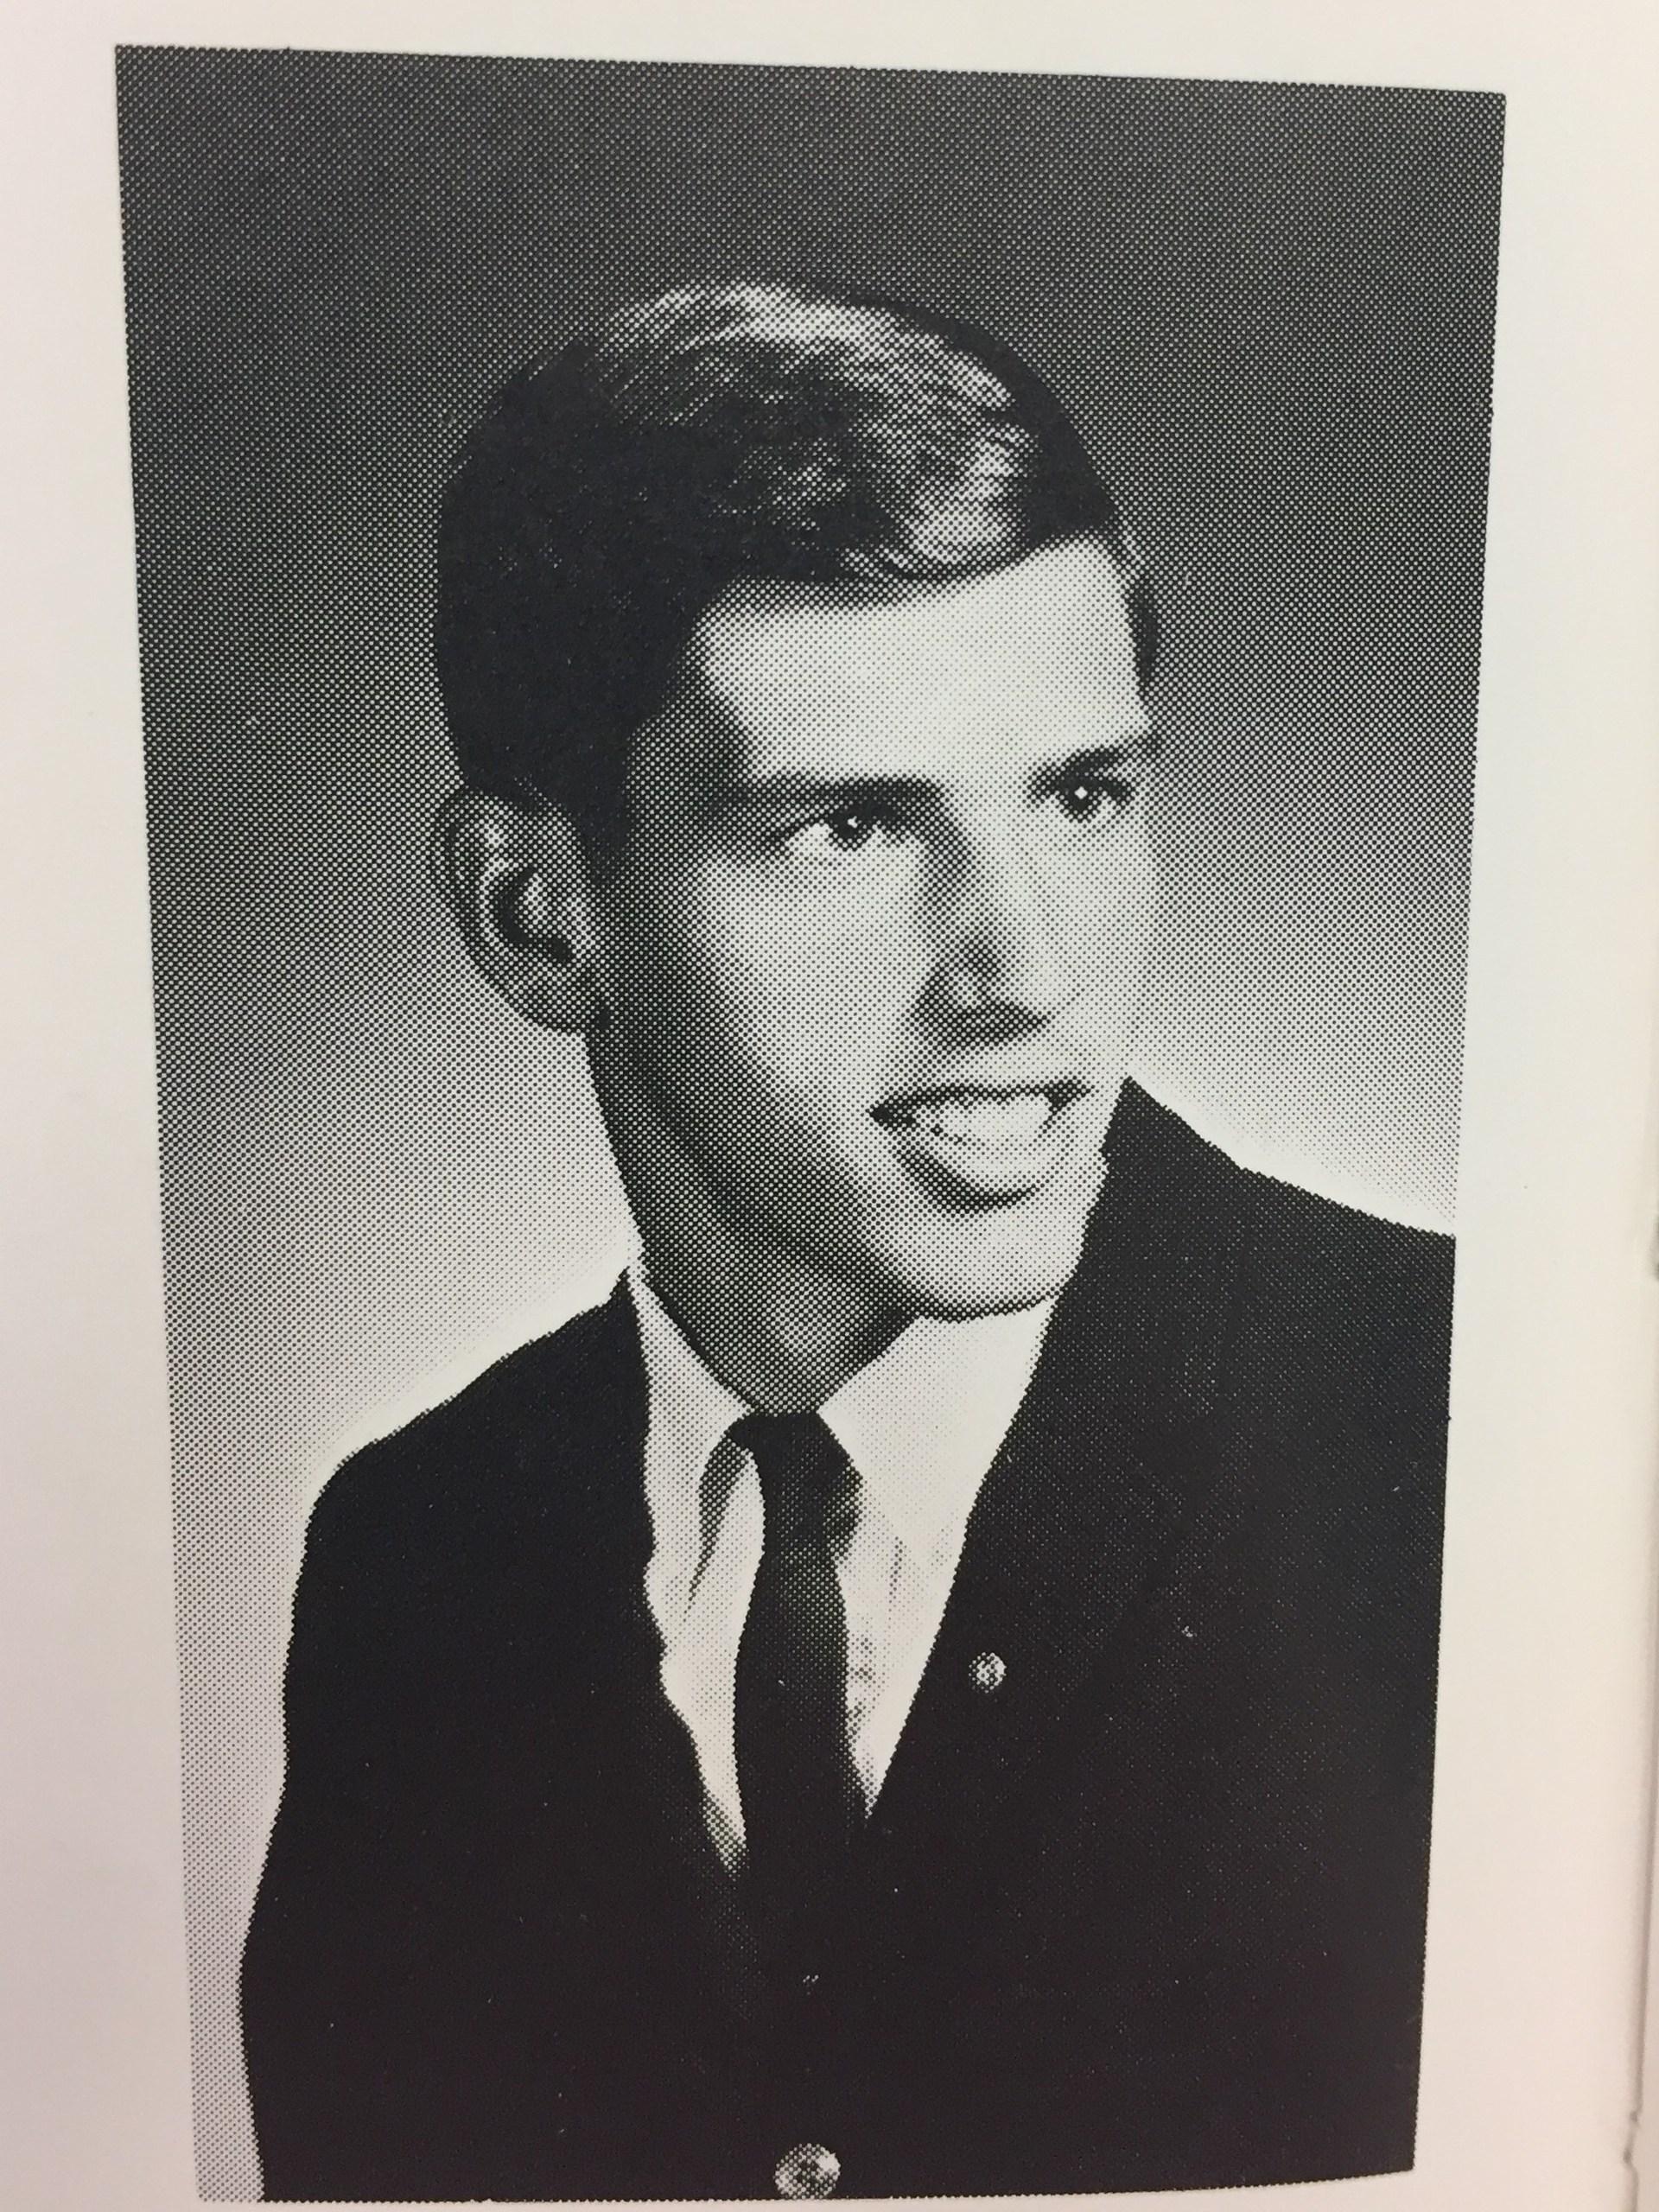 Photo of Bob Fisher.